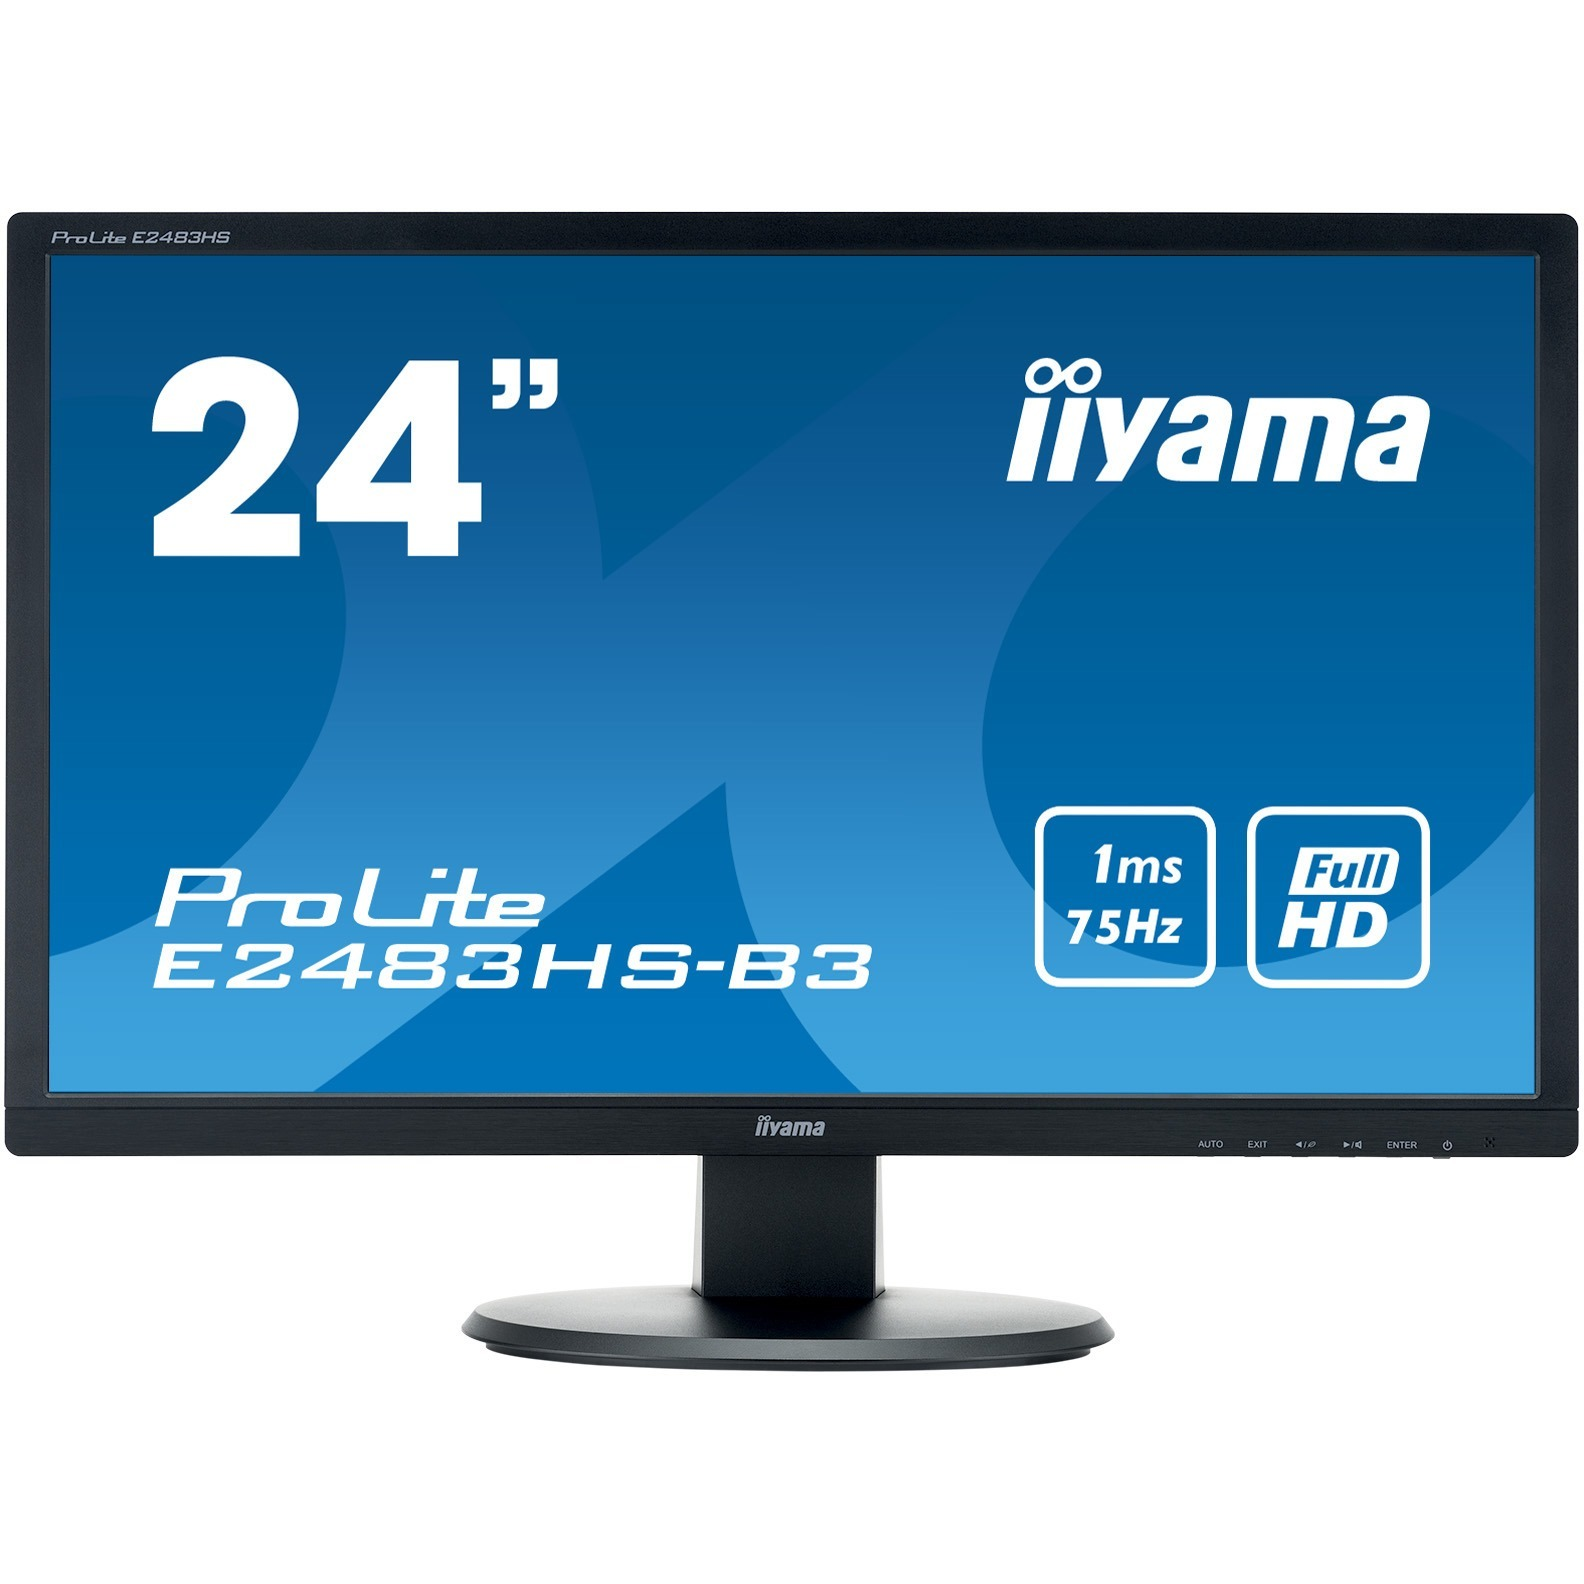 Iiyama ProLite E2483HS-B3  24inch WLED LCD Monitor - 16:9 - 1 ms